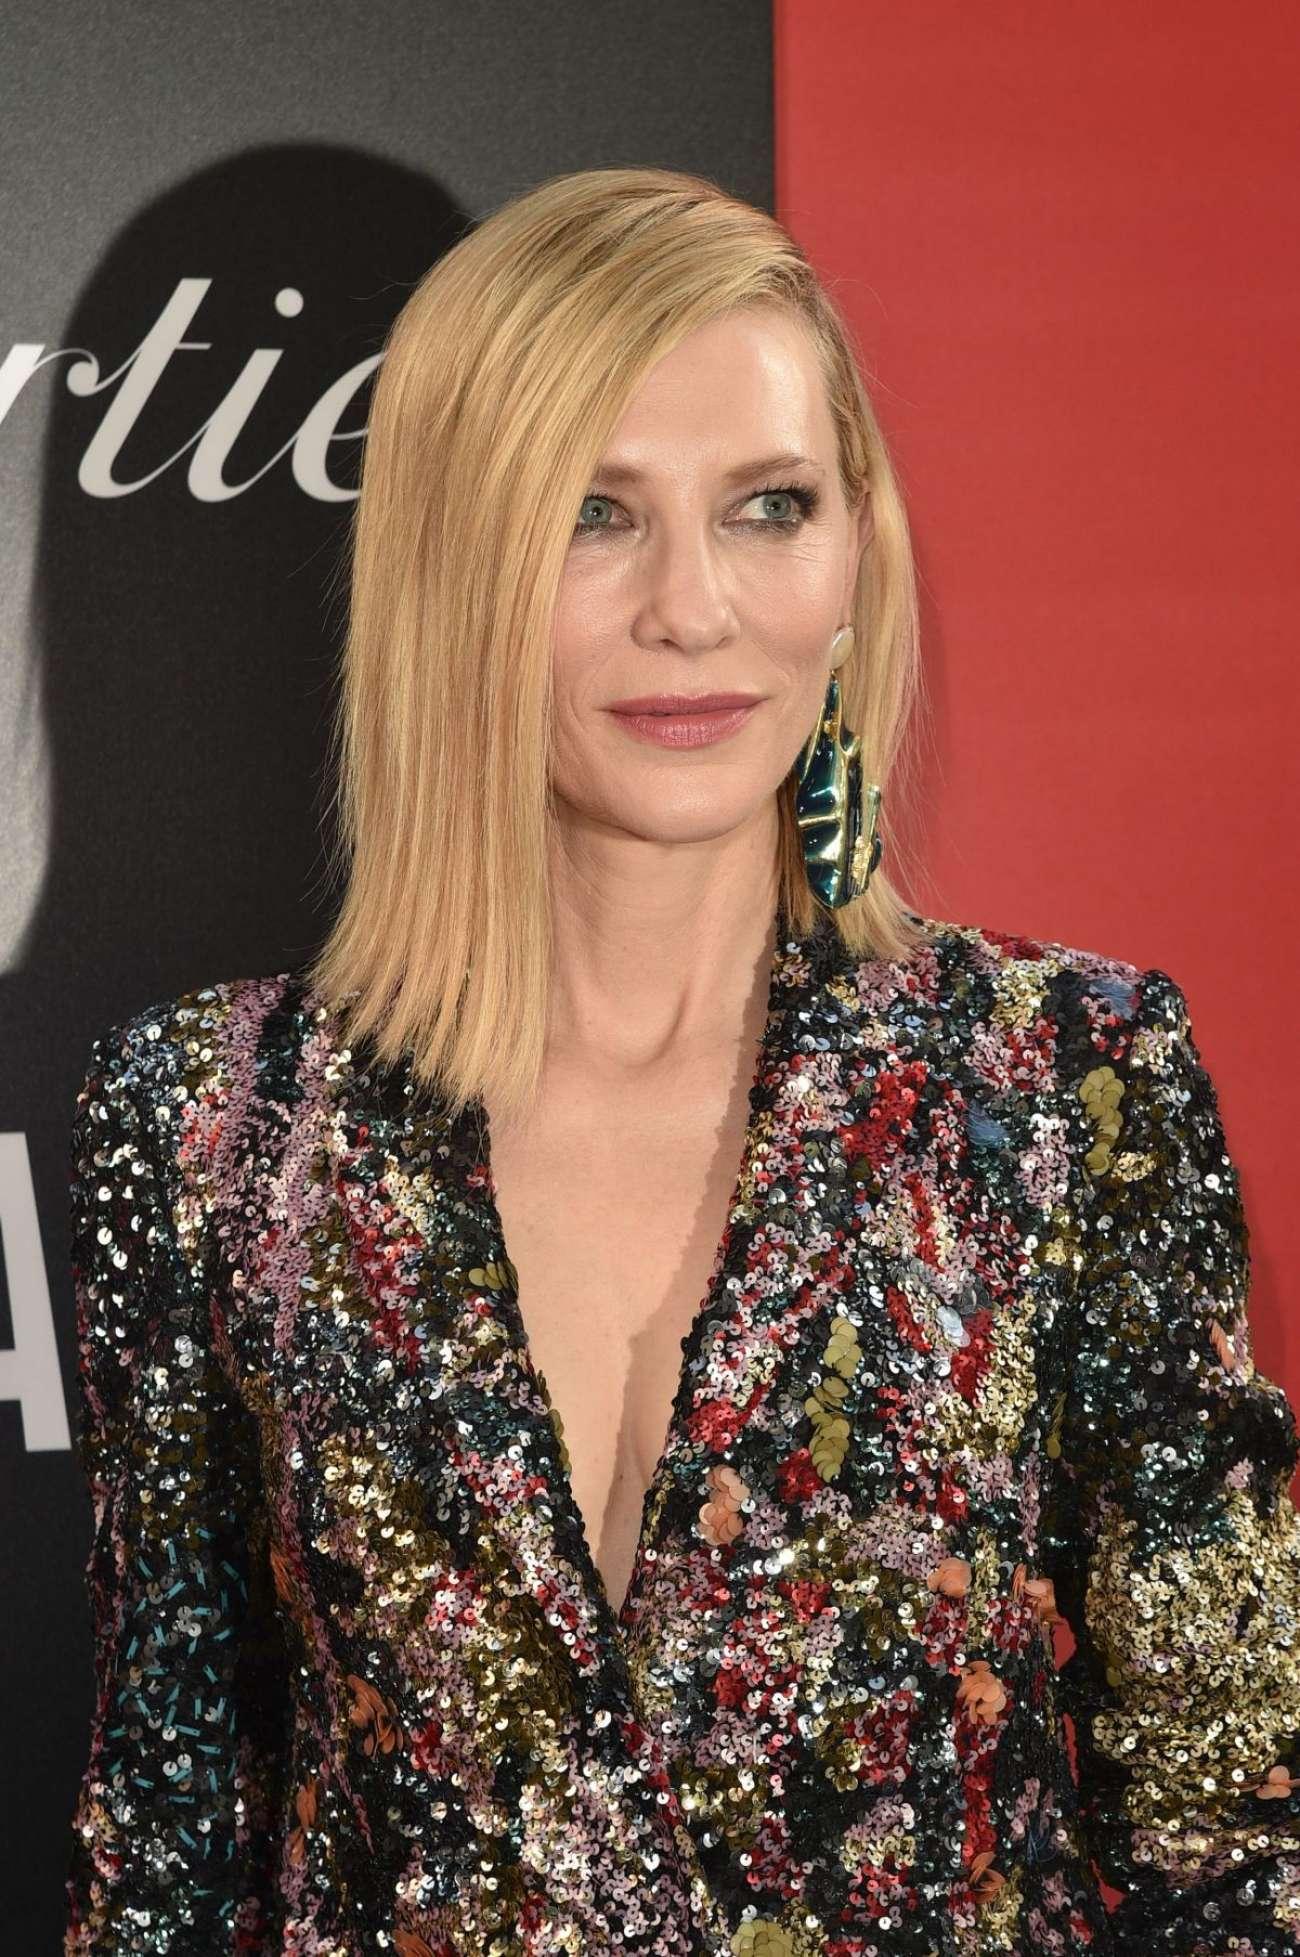 Cate Blanchett 2018 : Cate Blanchett: Ocean's 8 Premiere photocall In New York-08